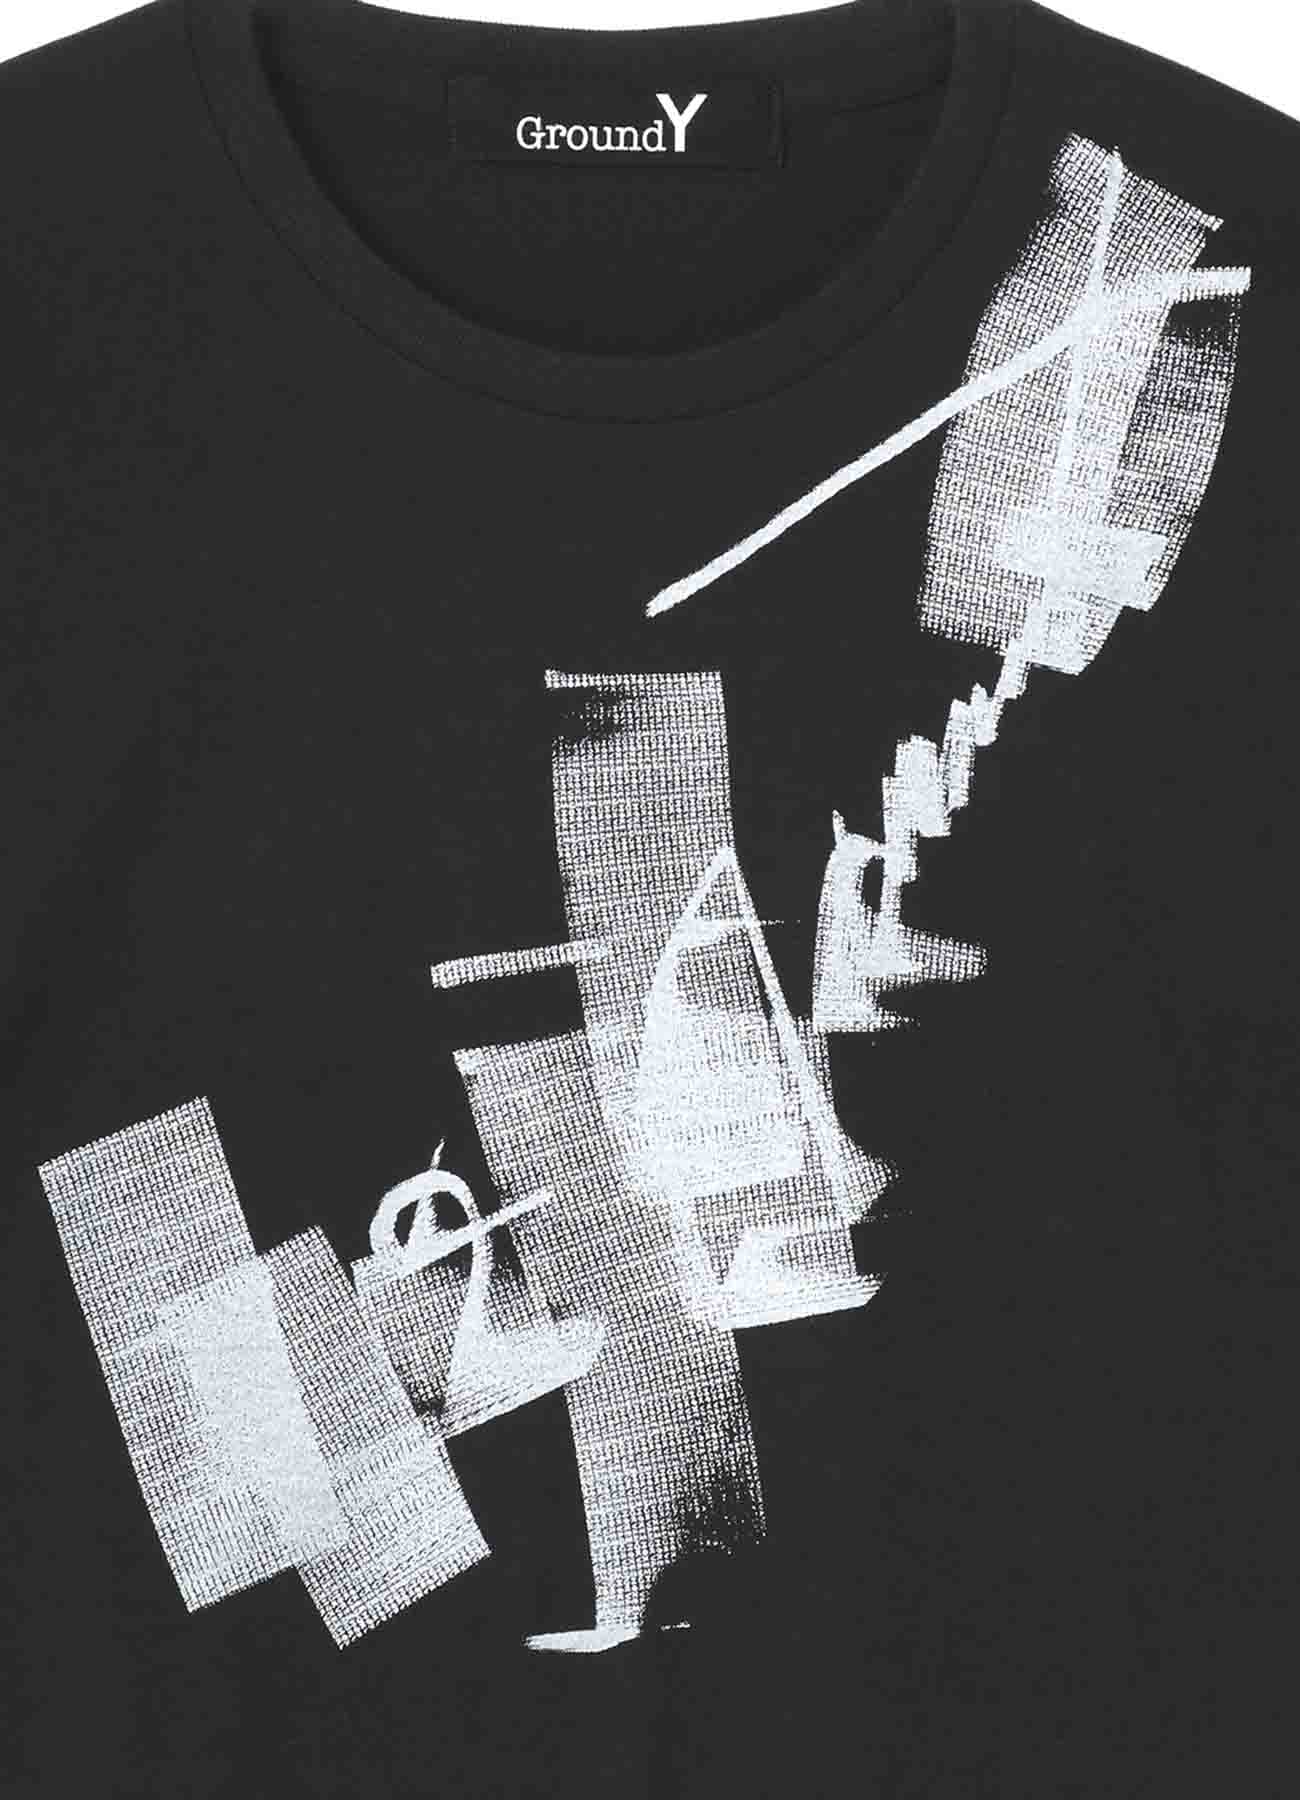 5.0oz棉辊图形T